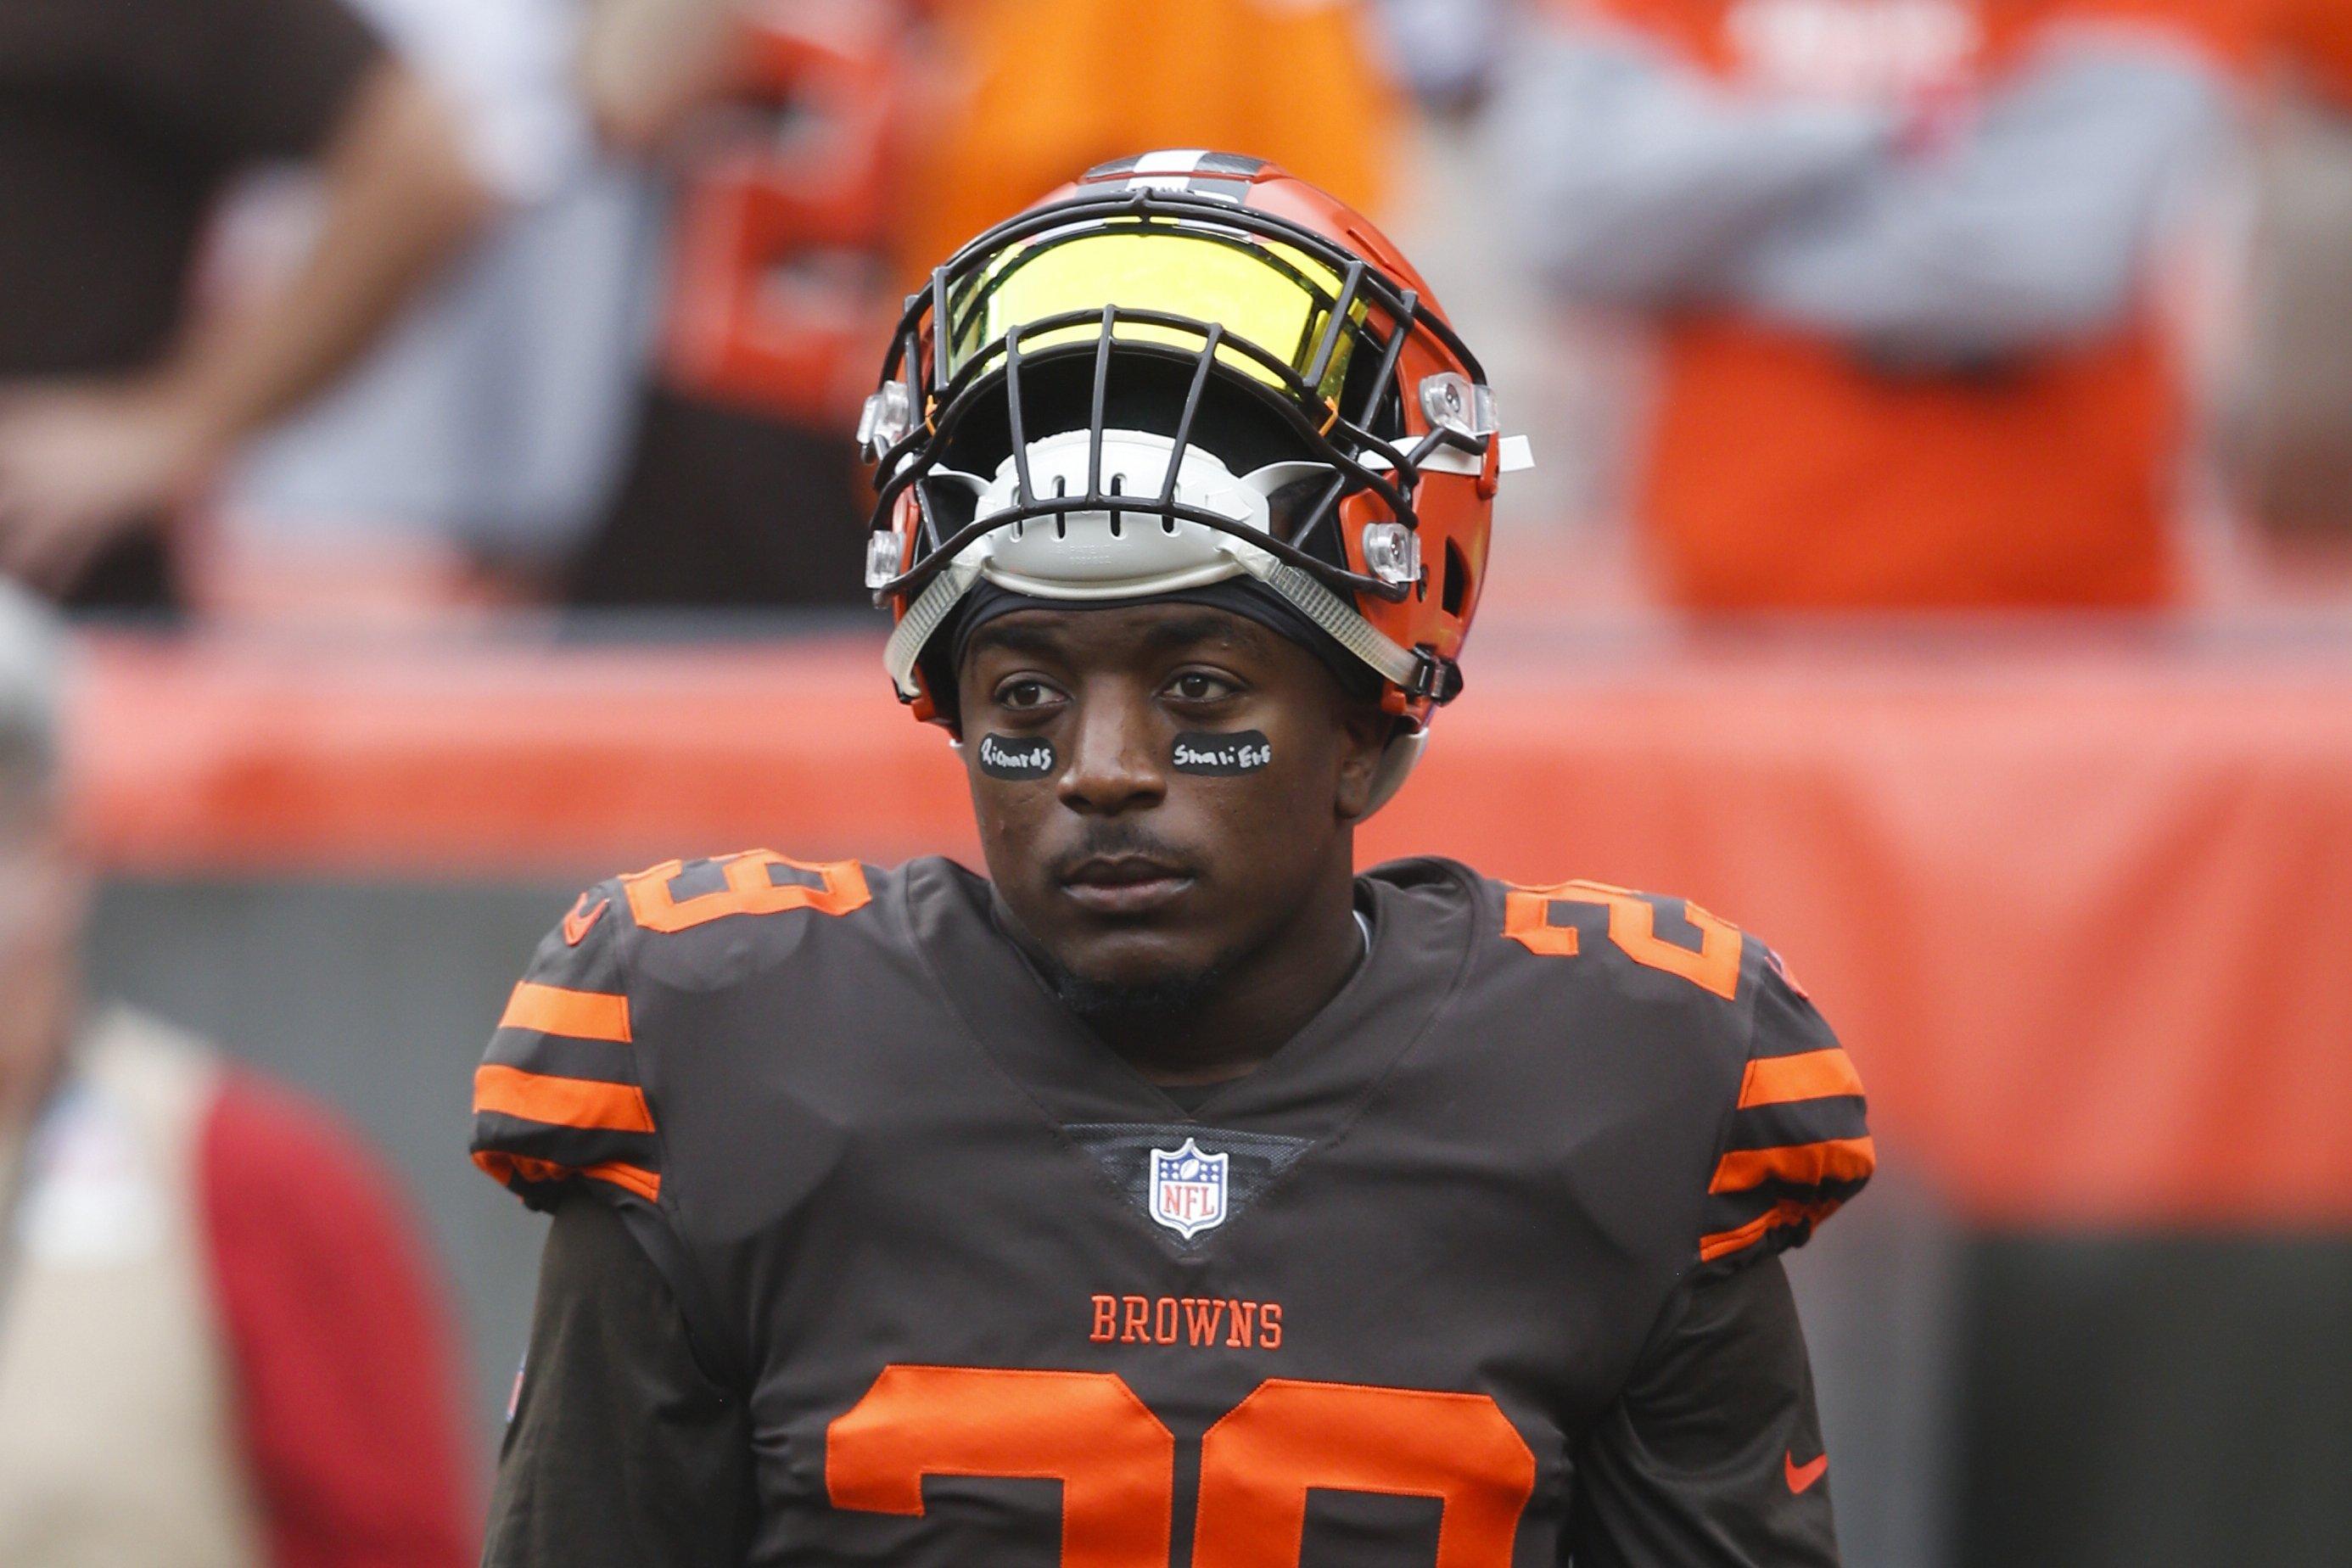 Browns trade RB Duke Johnson to Texans for 2020 draft pick